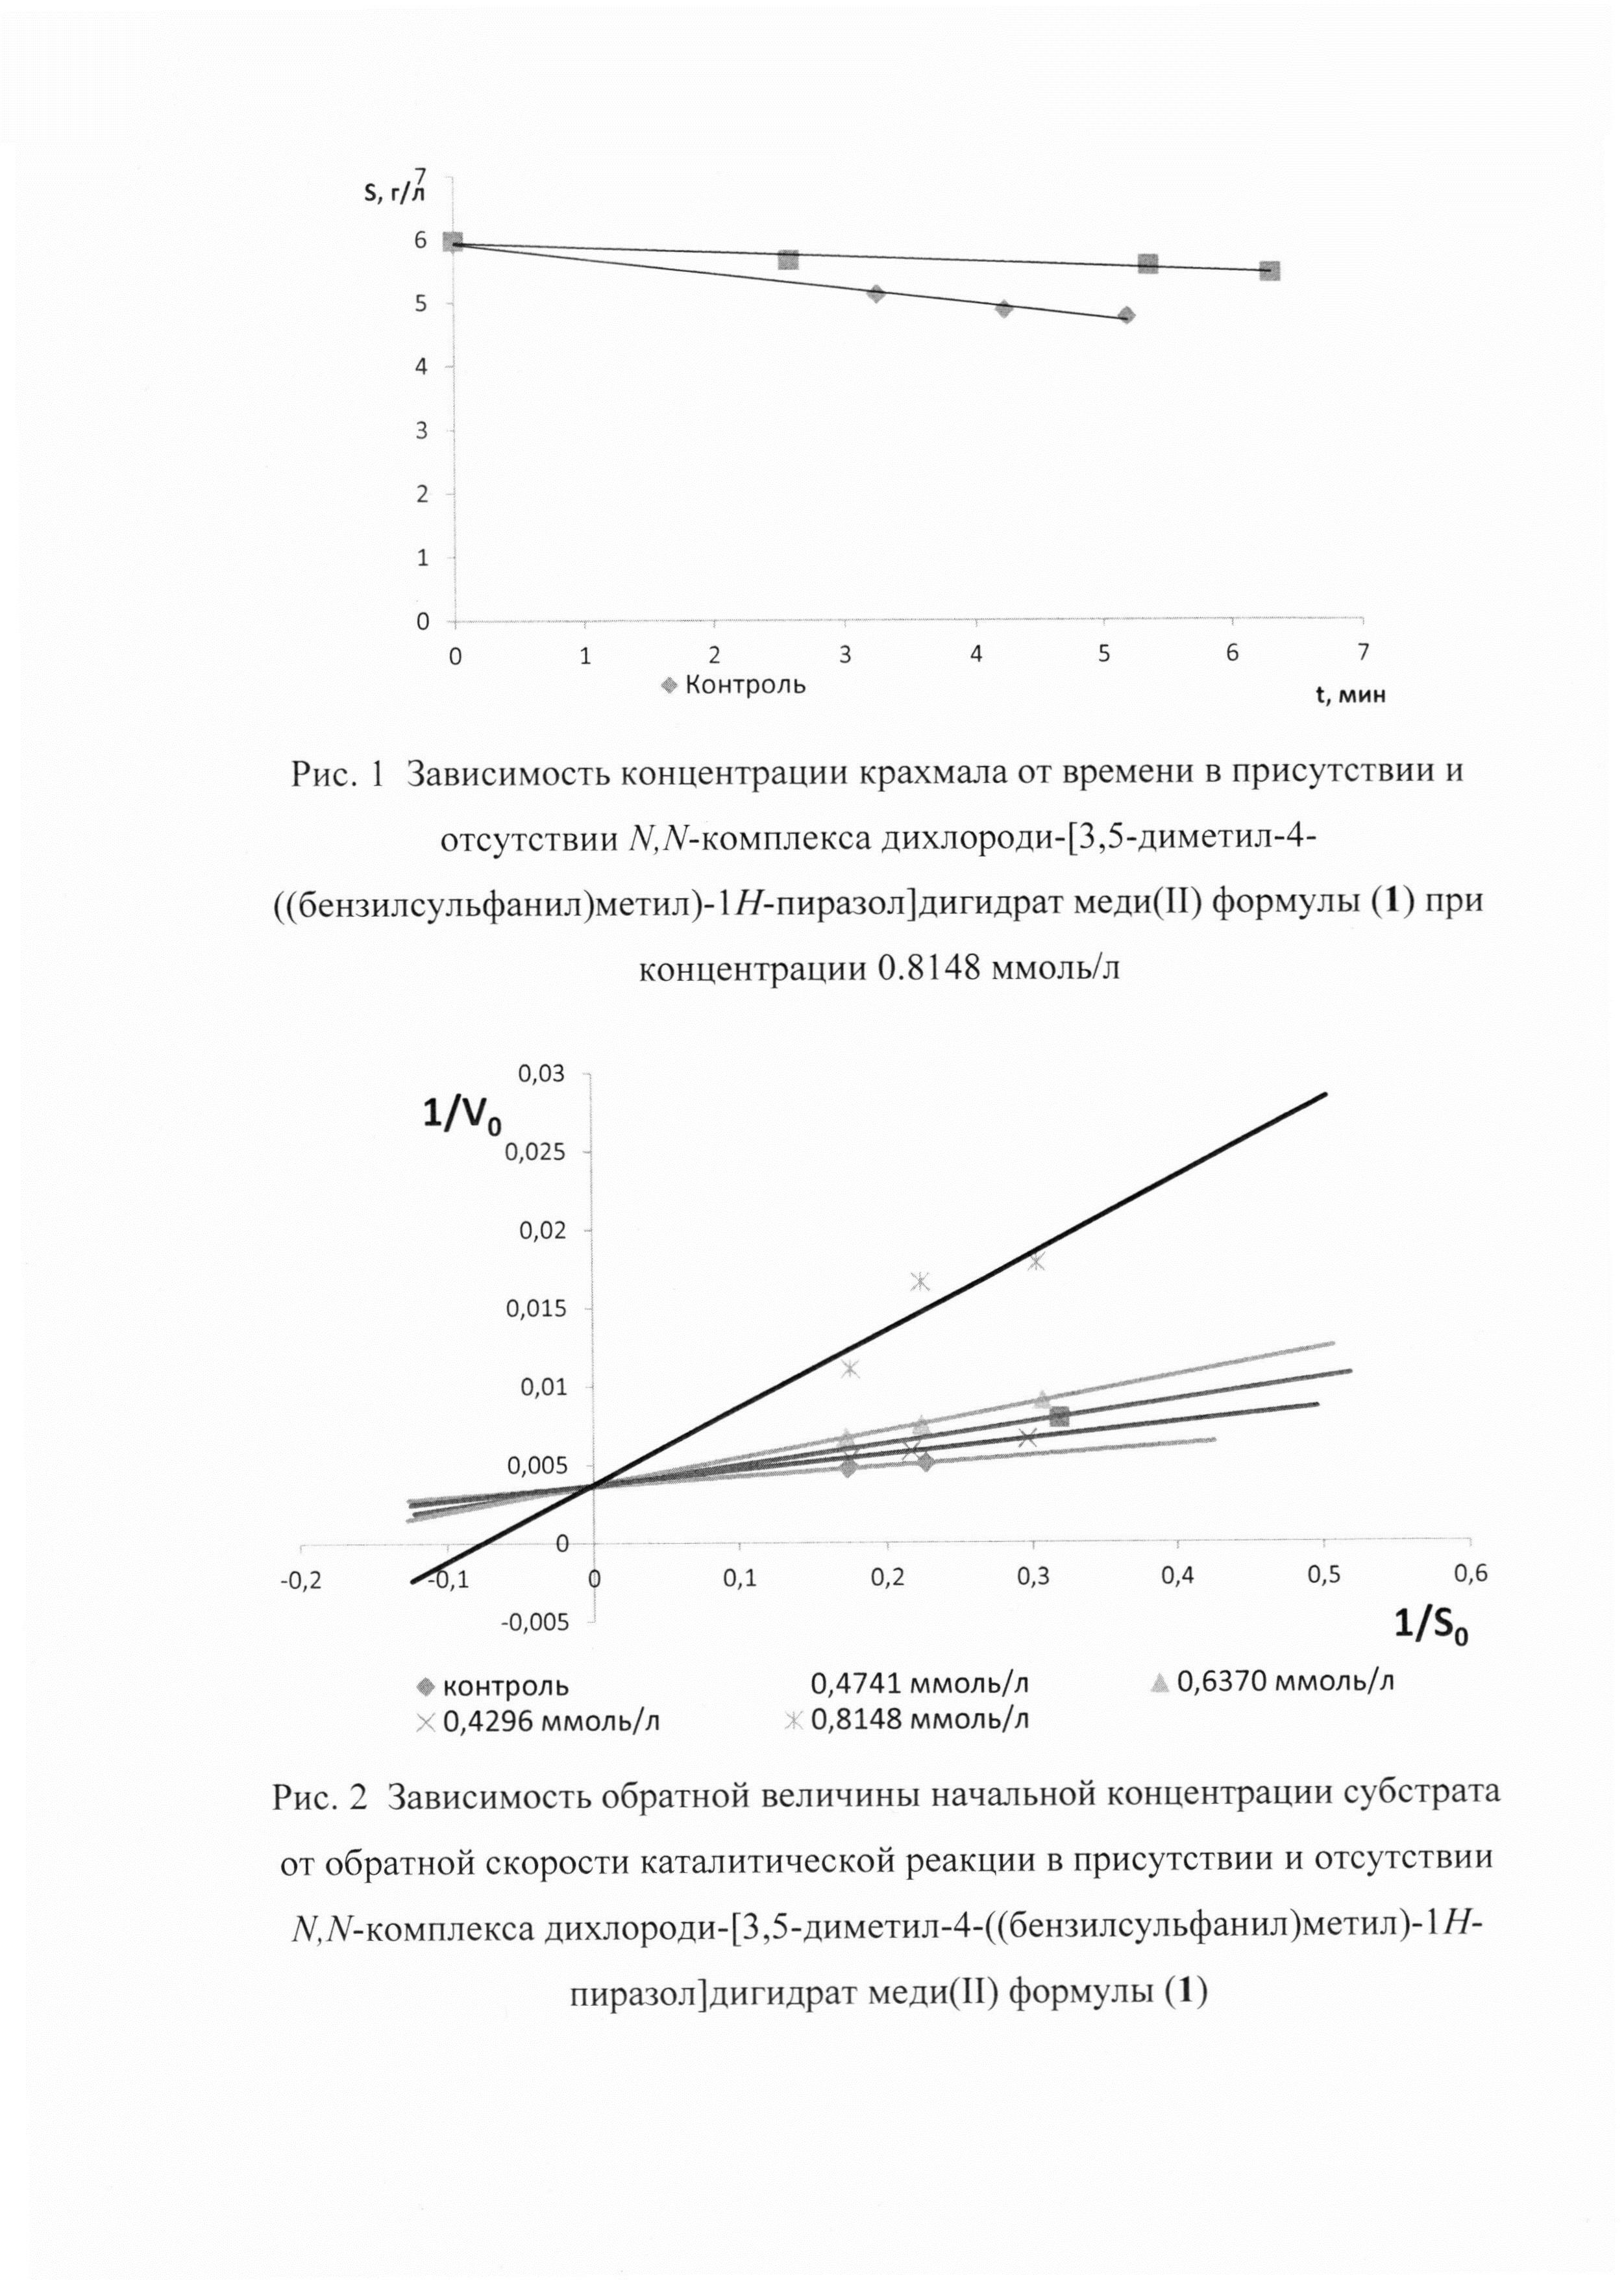 N,N-КОМПЛЕКС ДИХЛОРОДИ-[3,5-ДИМЕТИЛ-4-((БЕНЗИЛСУЛЬФАНИЛ)МЕТИЛ)-1H-ПИРАЗОЛ]ДИГИДРАТ МЕДИ(II) - СЕЛЕКТИВНЫЙ ИНГИБИТОР ФЕРМЕНТА α-АМИЛАЗА